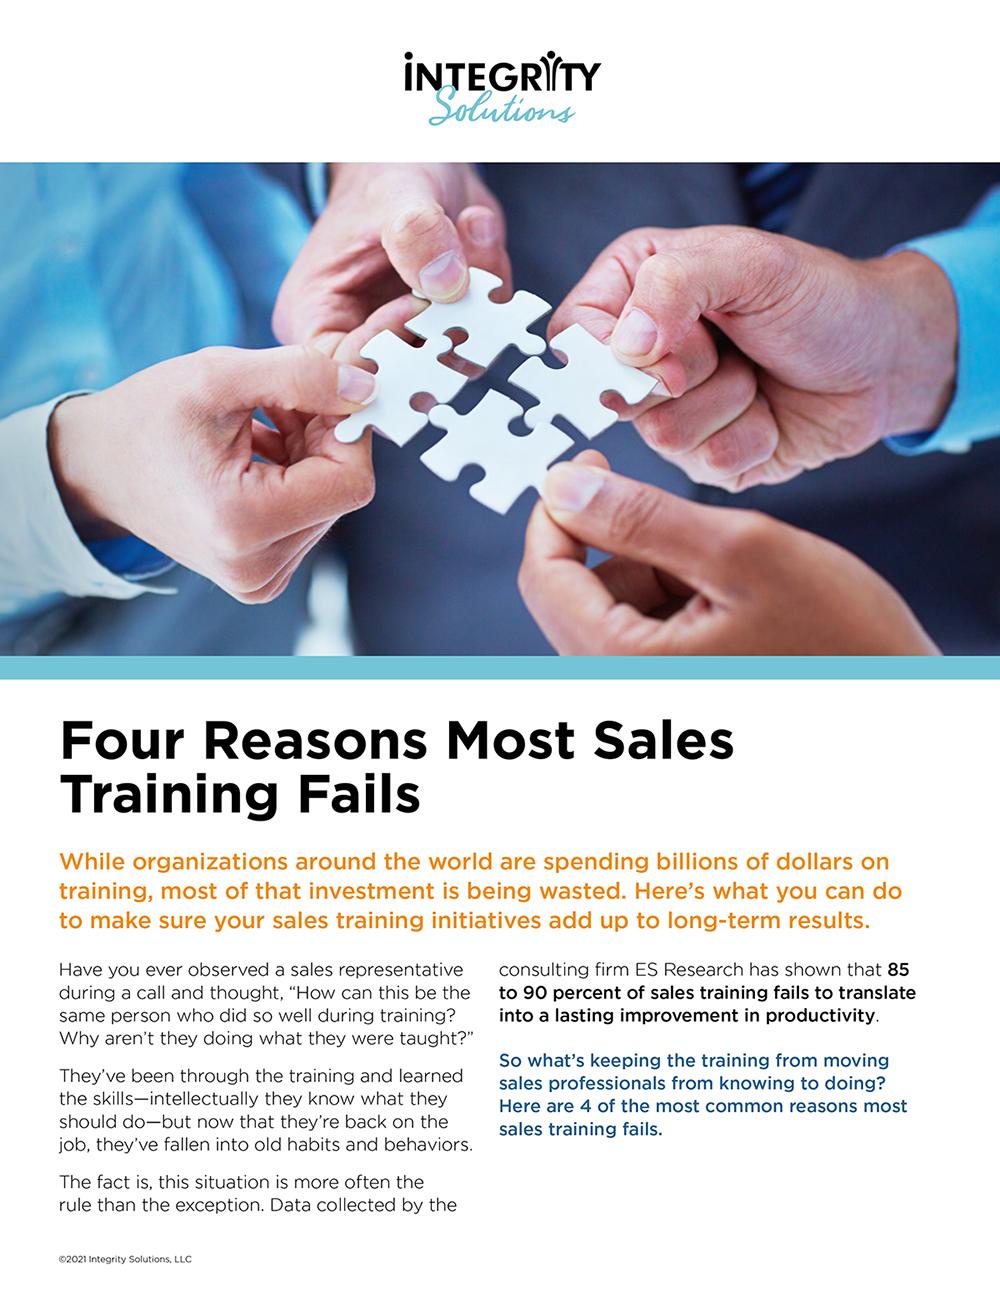 4 Reasons Most Sales Training Fails